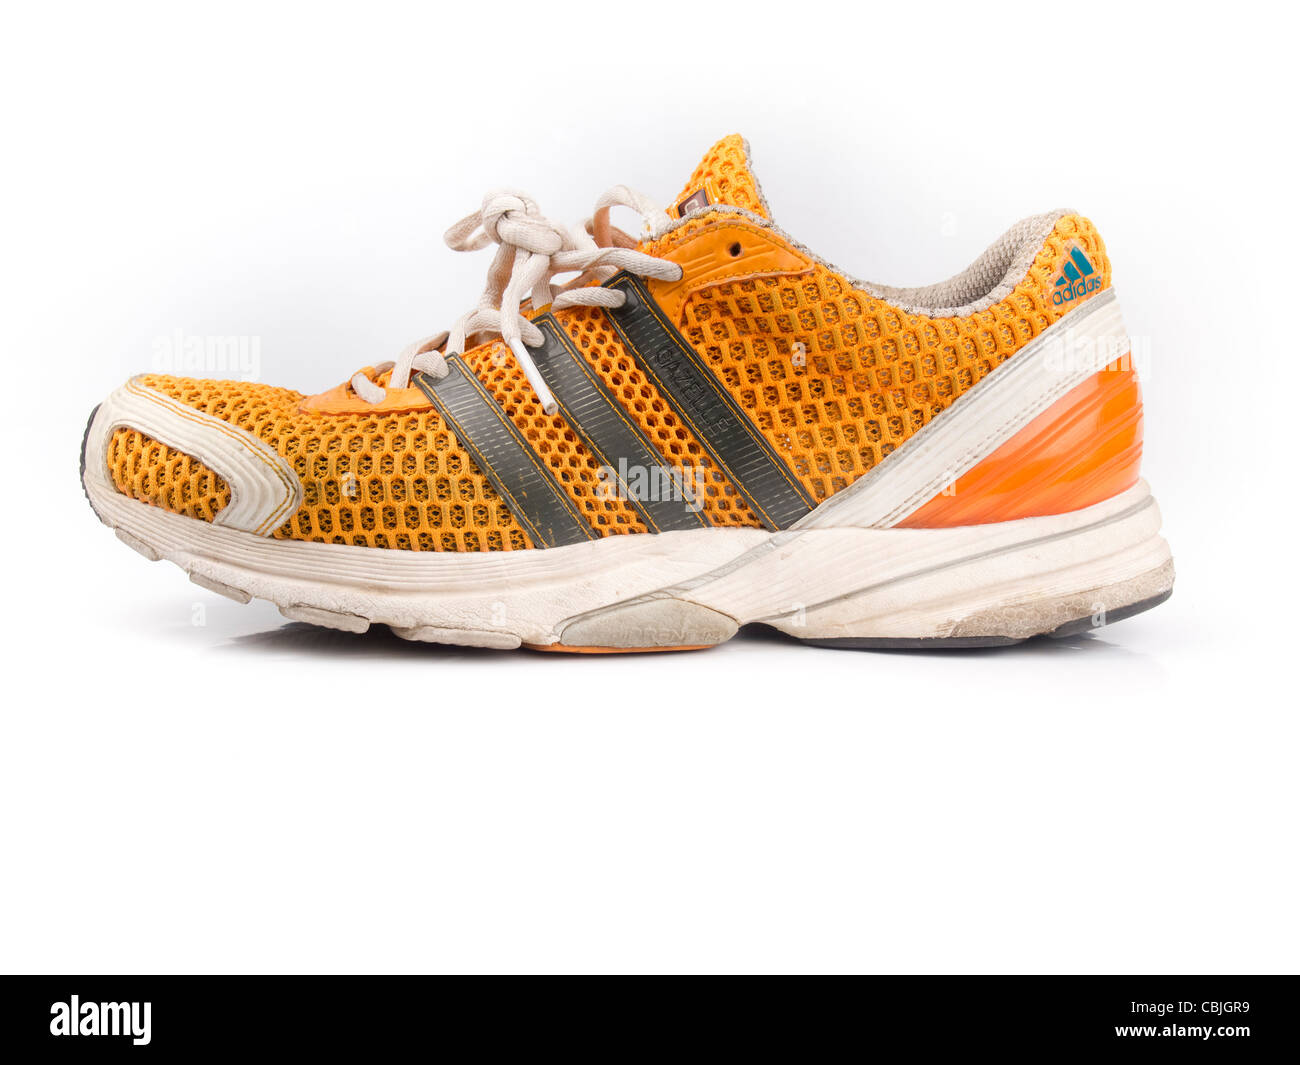 sale retailer 207aa 9aaaa Adidas arancione scarpe da corsa Immagini Stock